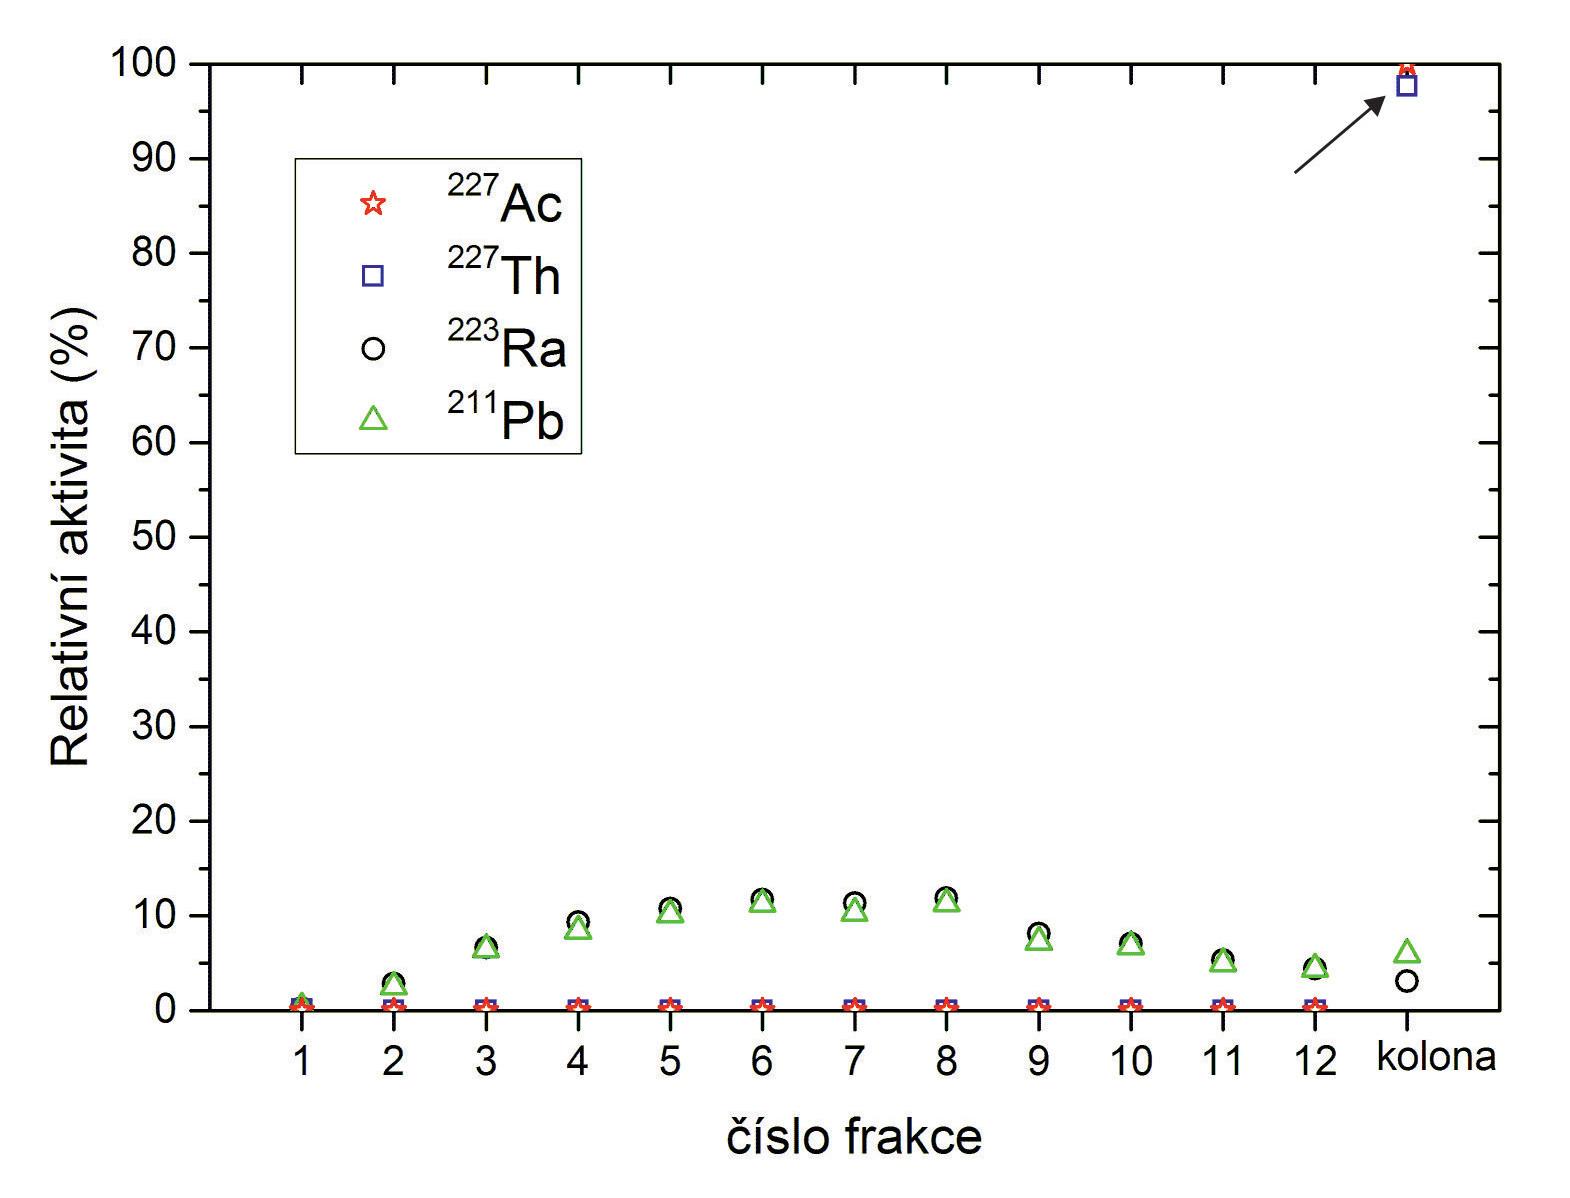 Eluční profil <sup>227</sup>Ac, <sup>227</sup>Th, <sup>223</sup>Ra a <sup>211</sup>Pb v prostředí 0,7M HNO<sub>3</sub> v 80% MeOH.